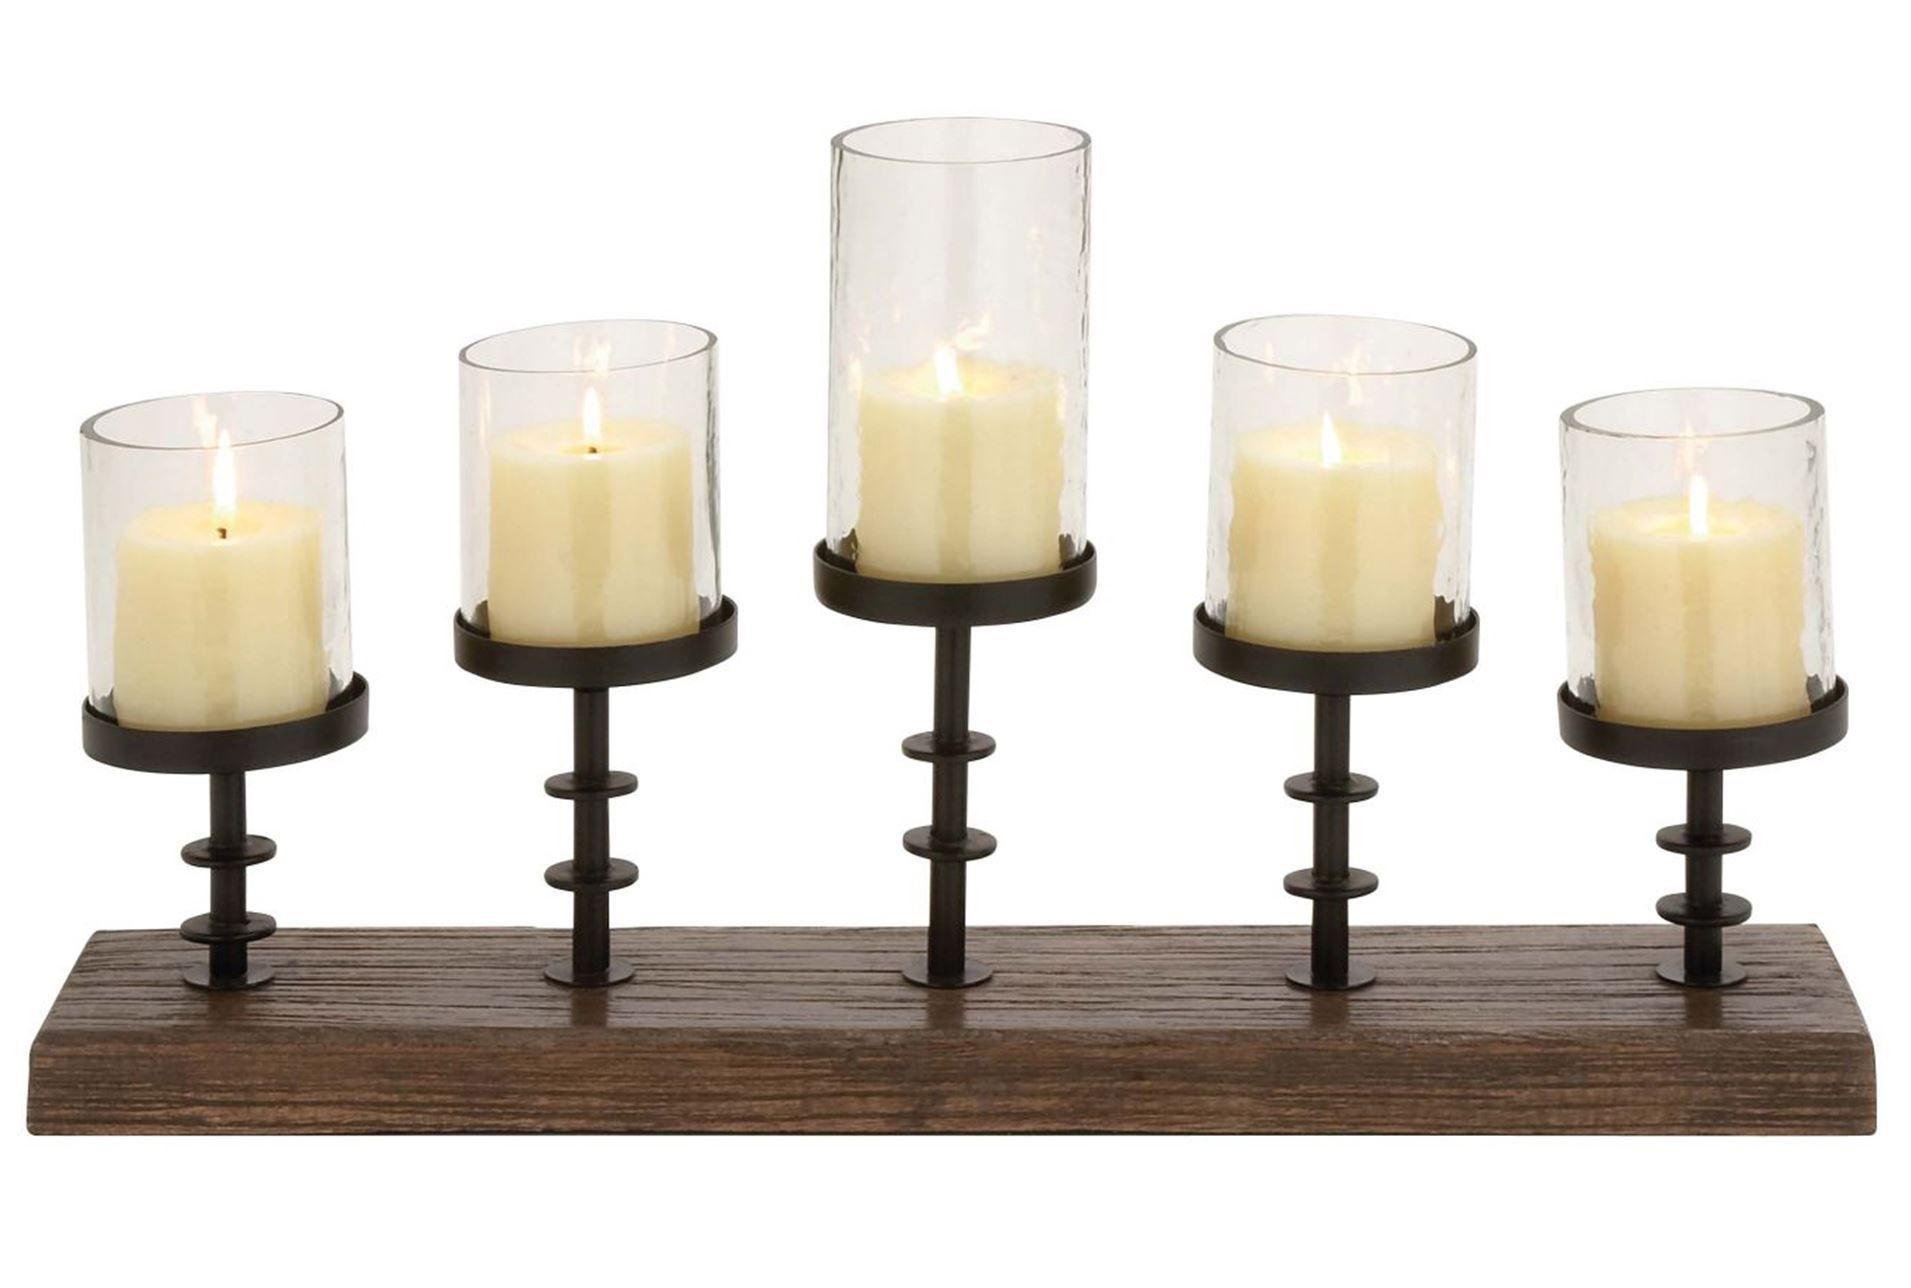 Wood metal glad candleabra signature decor pinterest metals